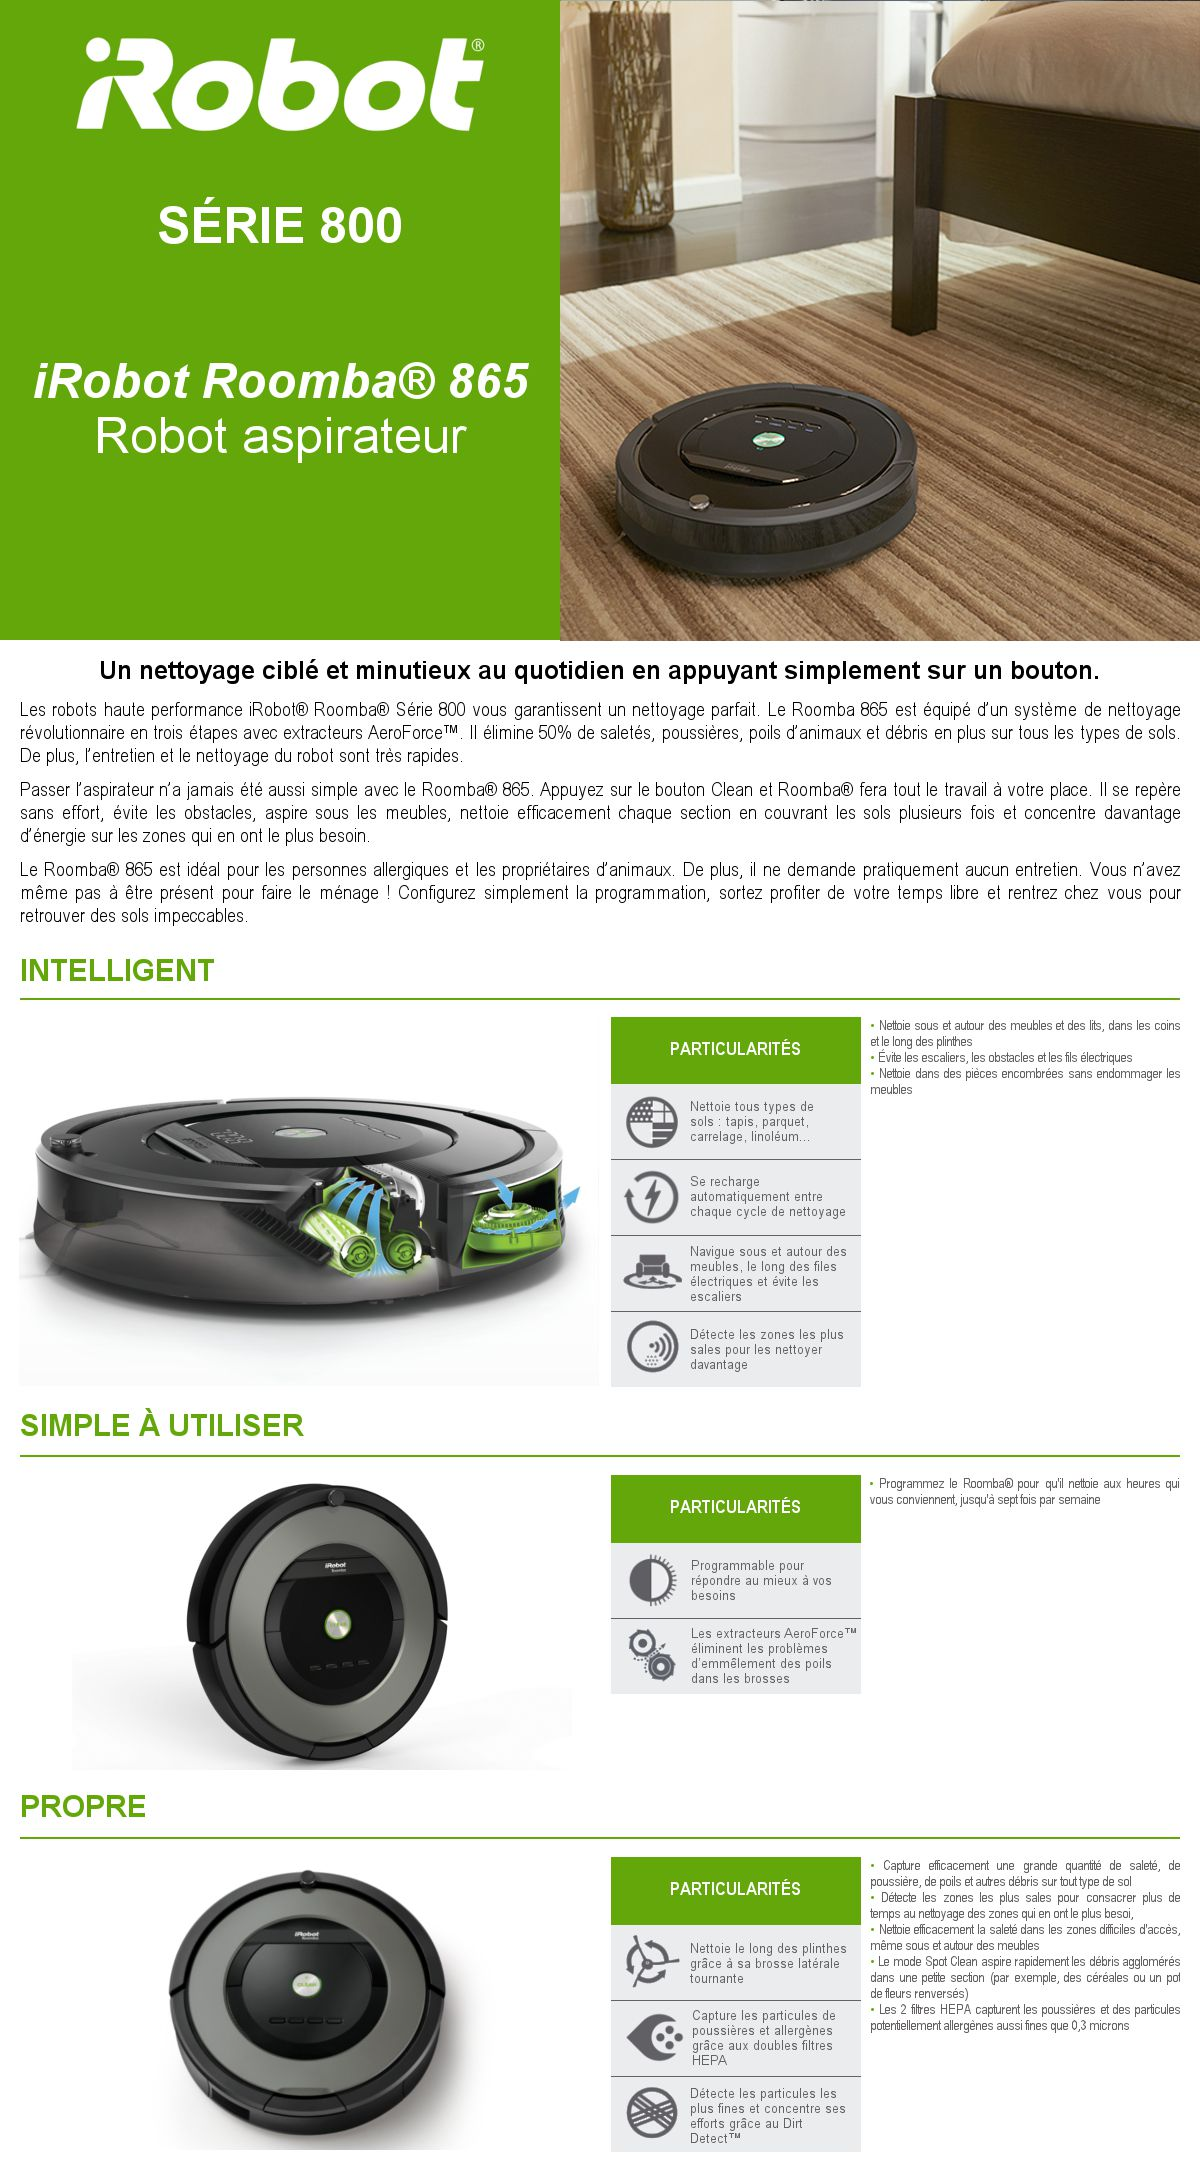 irobot roomba 865 aspirateur robot 33w 58 db gris. Black Bedroom Furniture Sets. Home Design Ideas